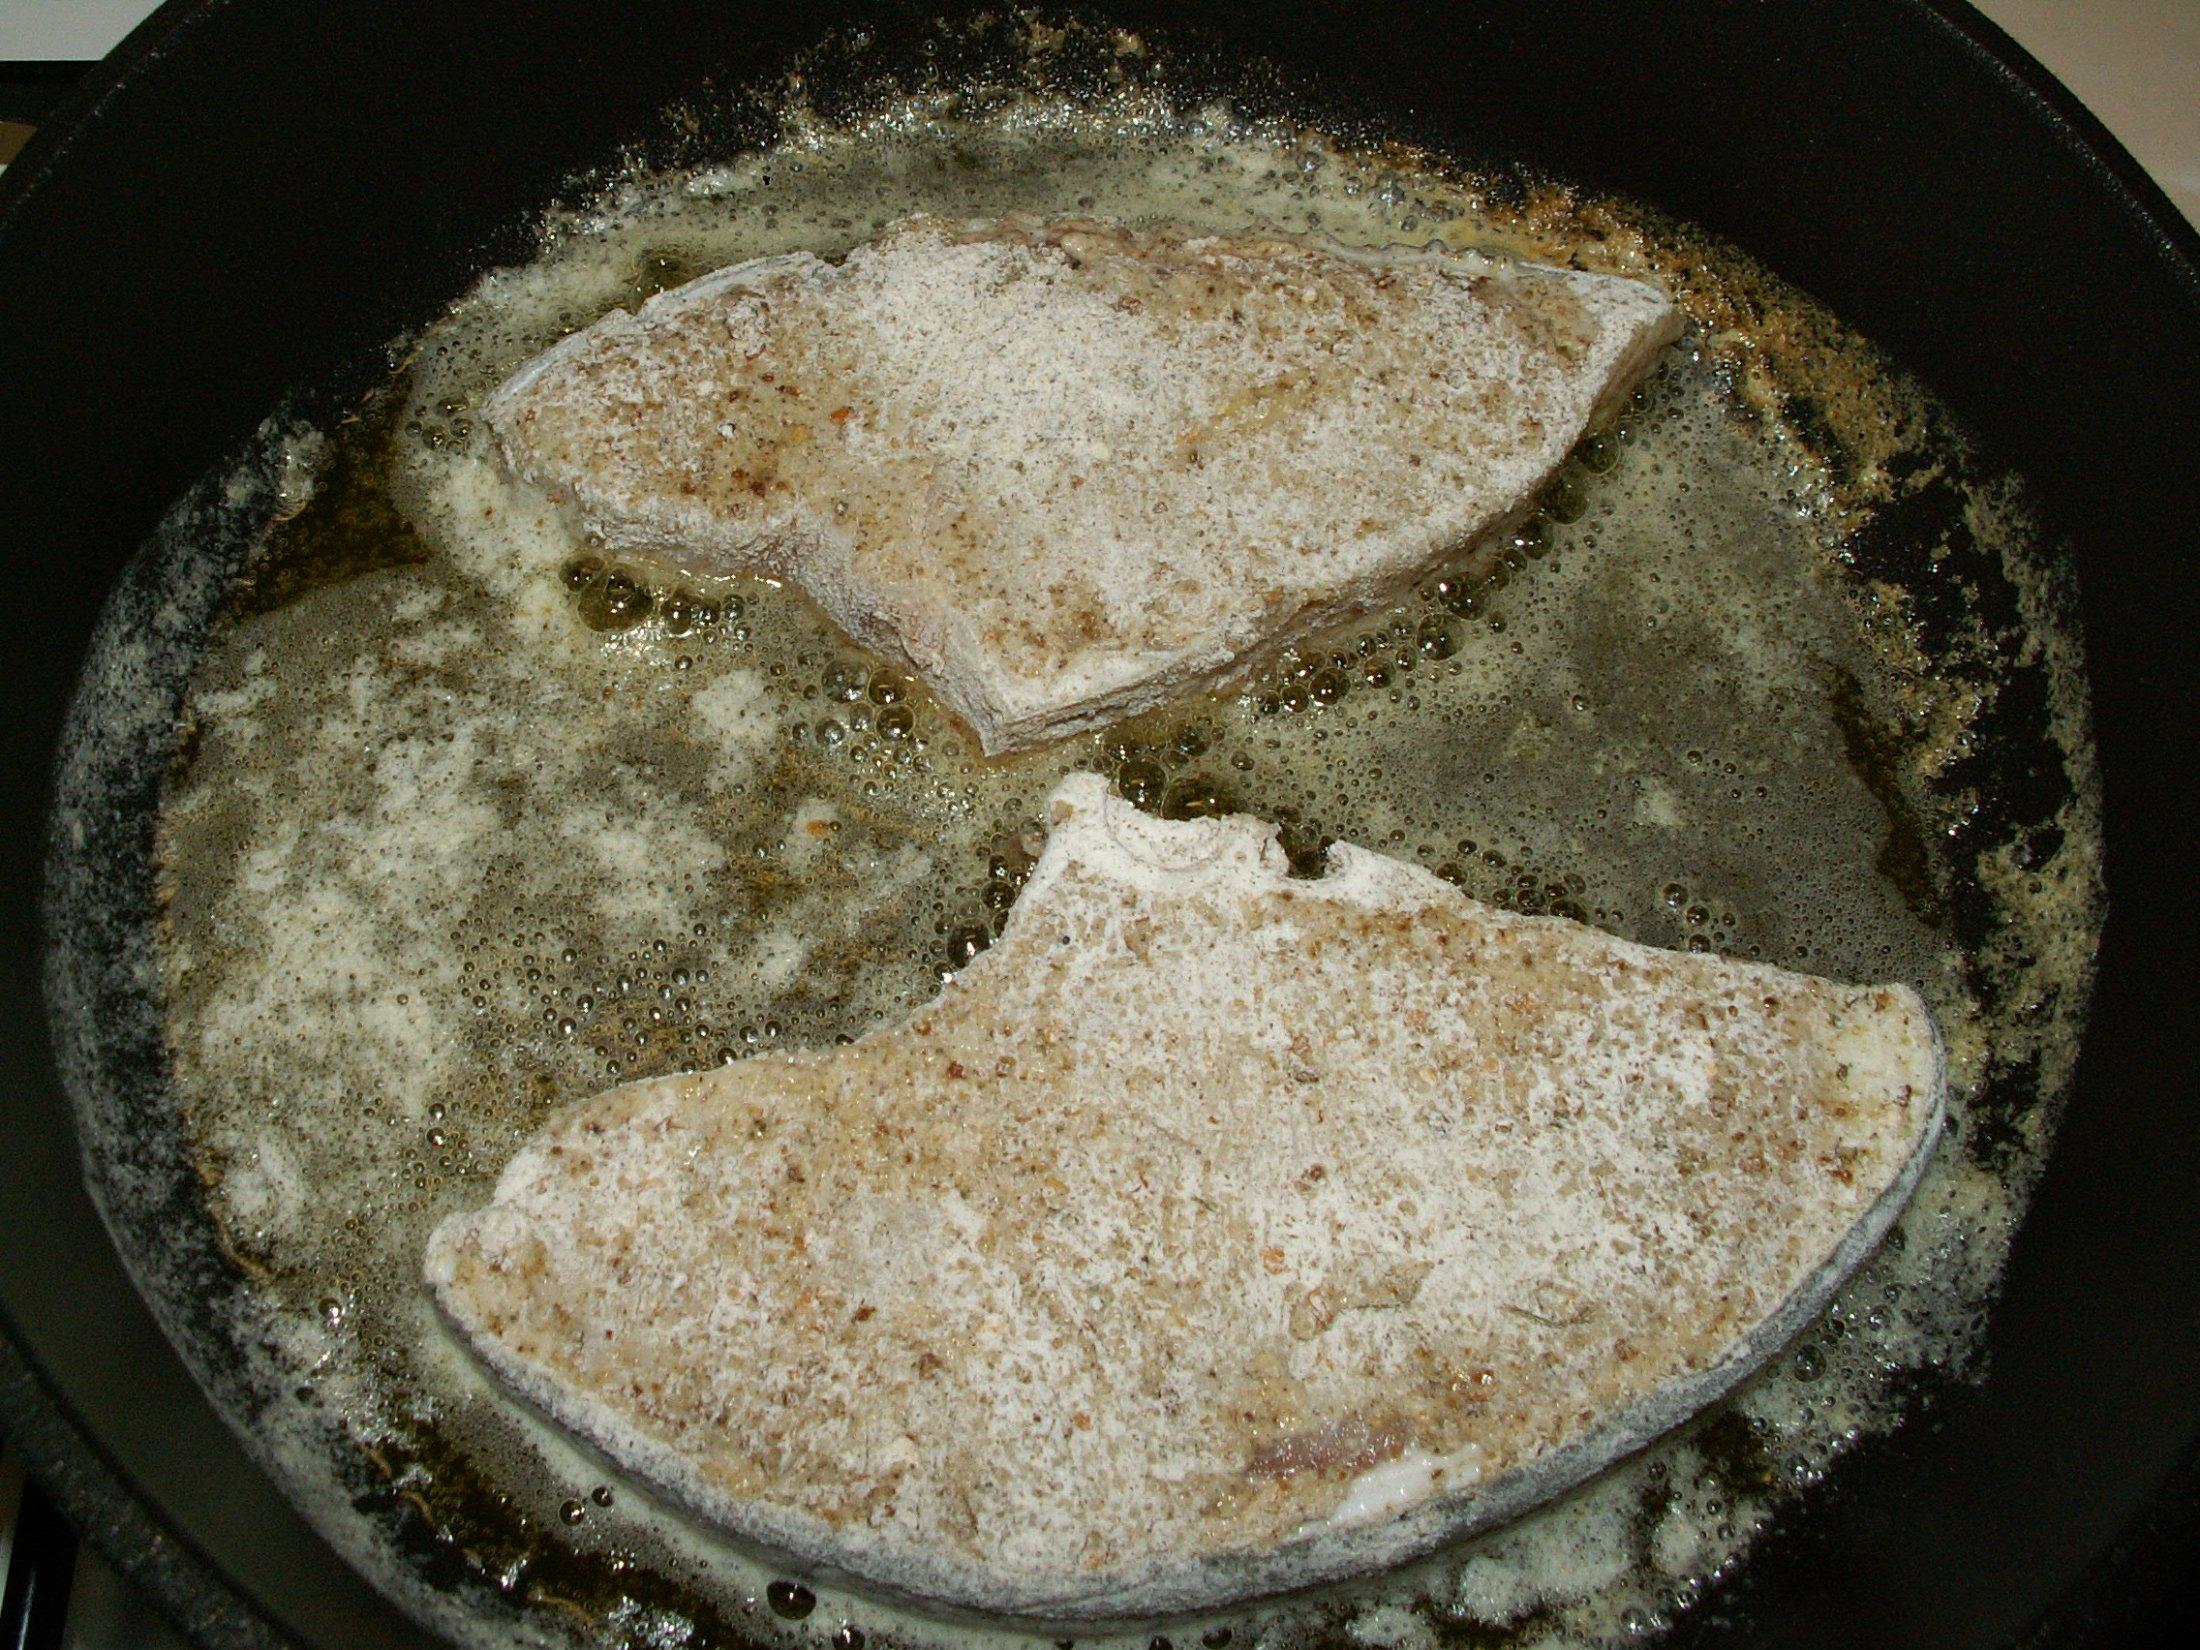 Recept Pečený žralok - Žralok vložený do másla na pánev.